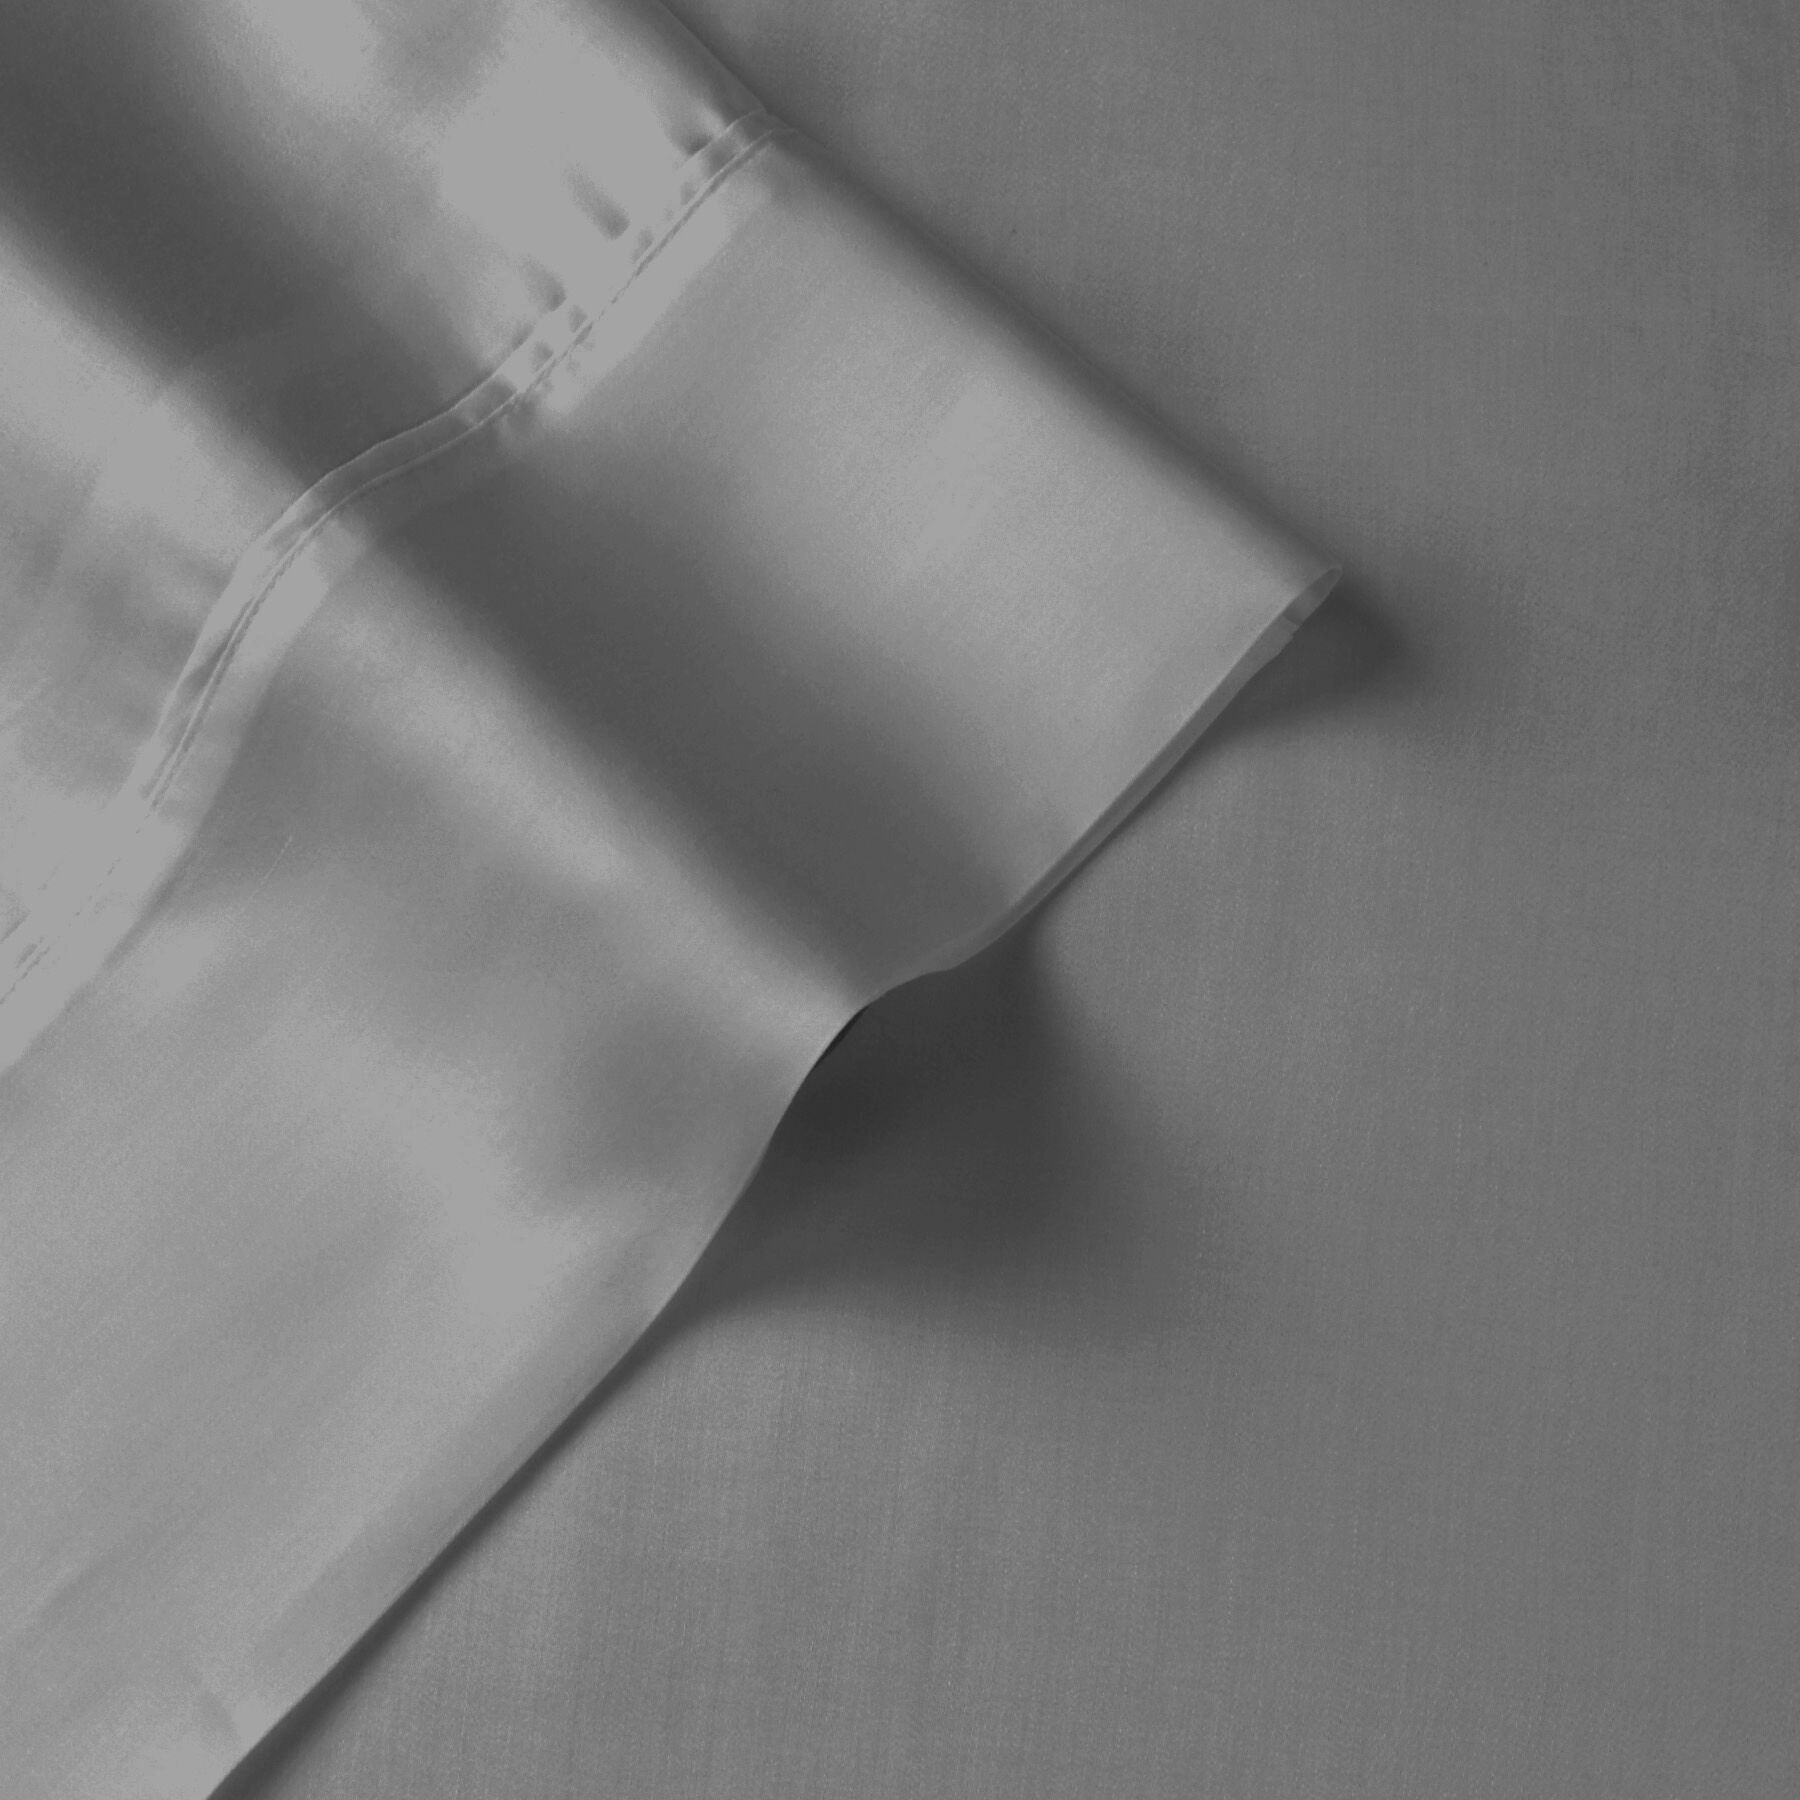 Tencel 300 Thread Count Sheet Set Size: King, Color: Glacier Grey